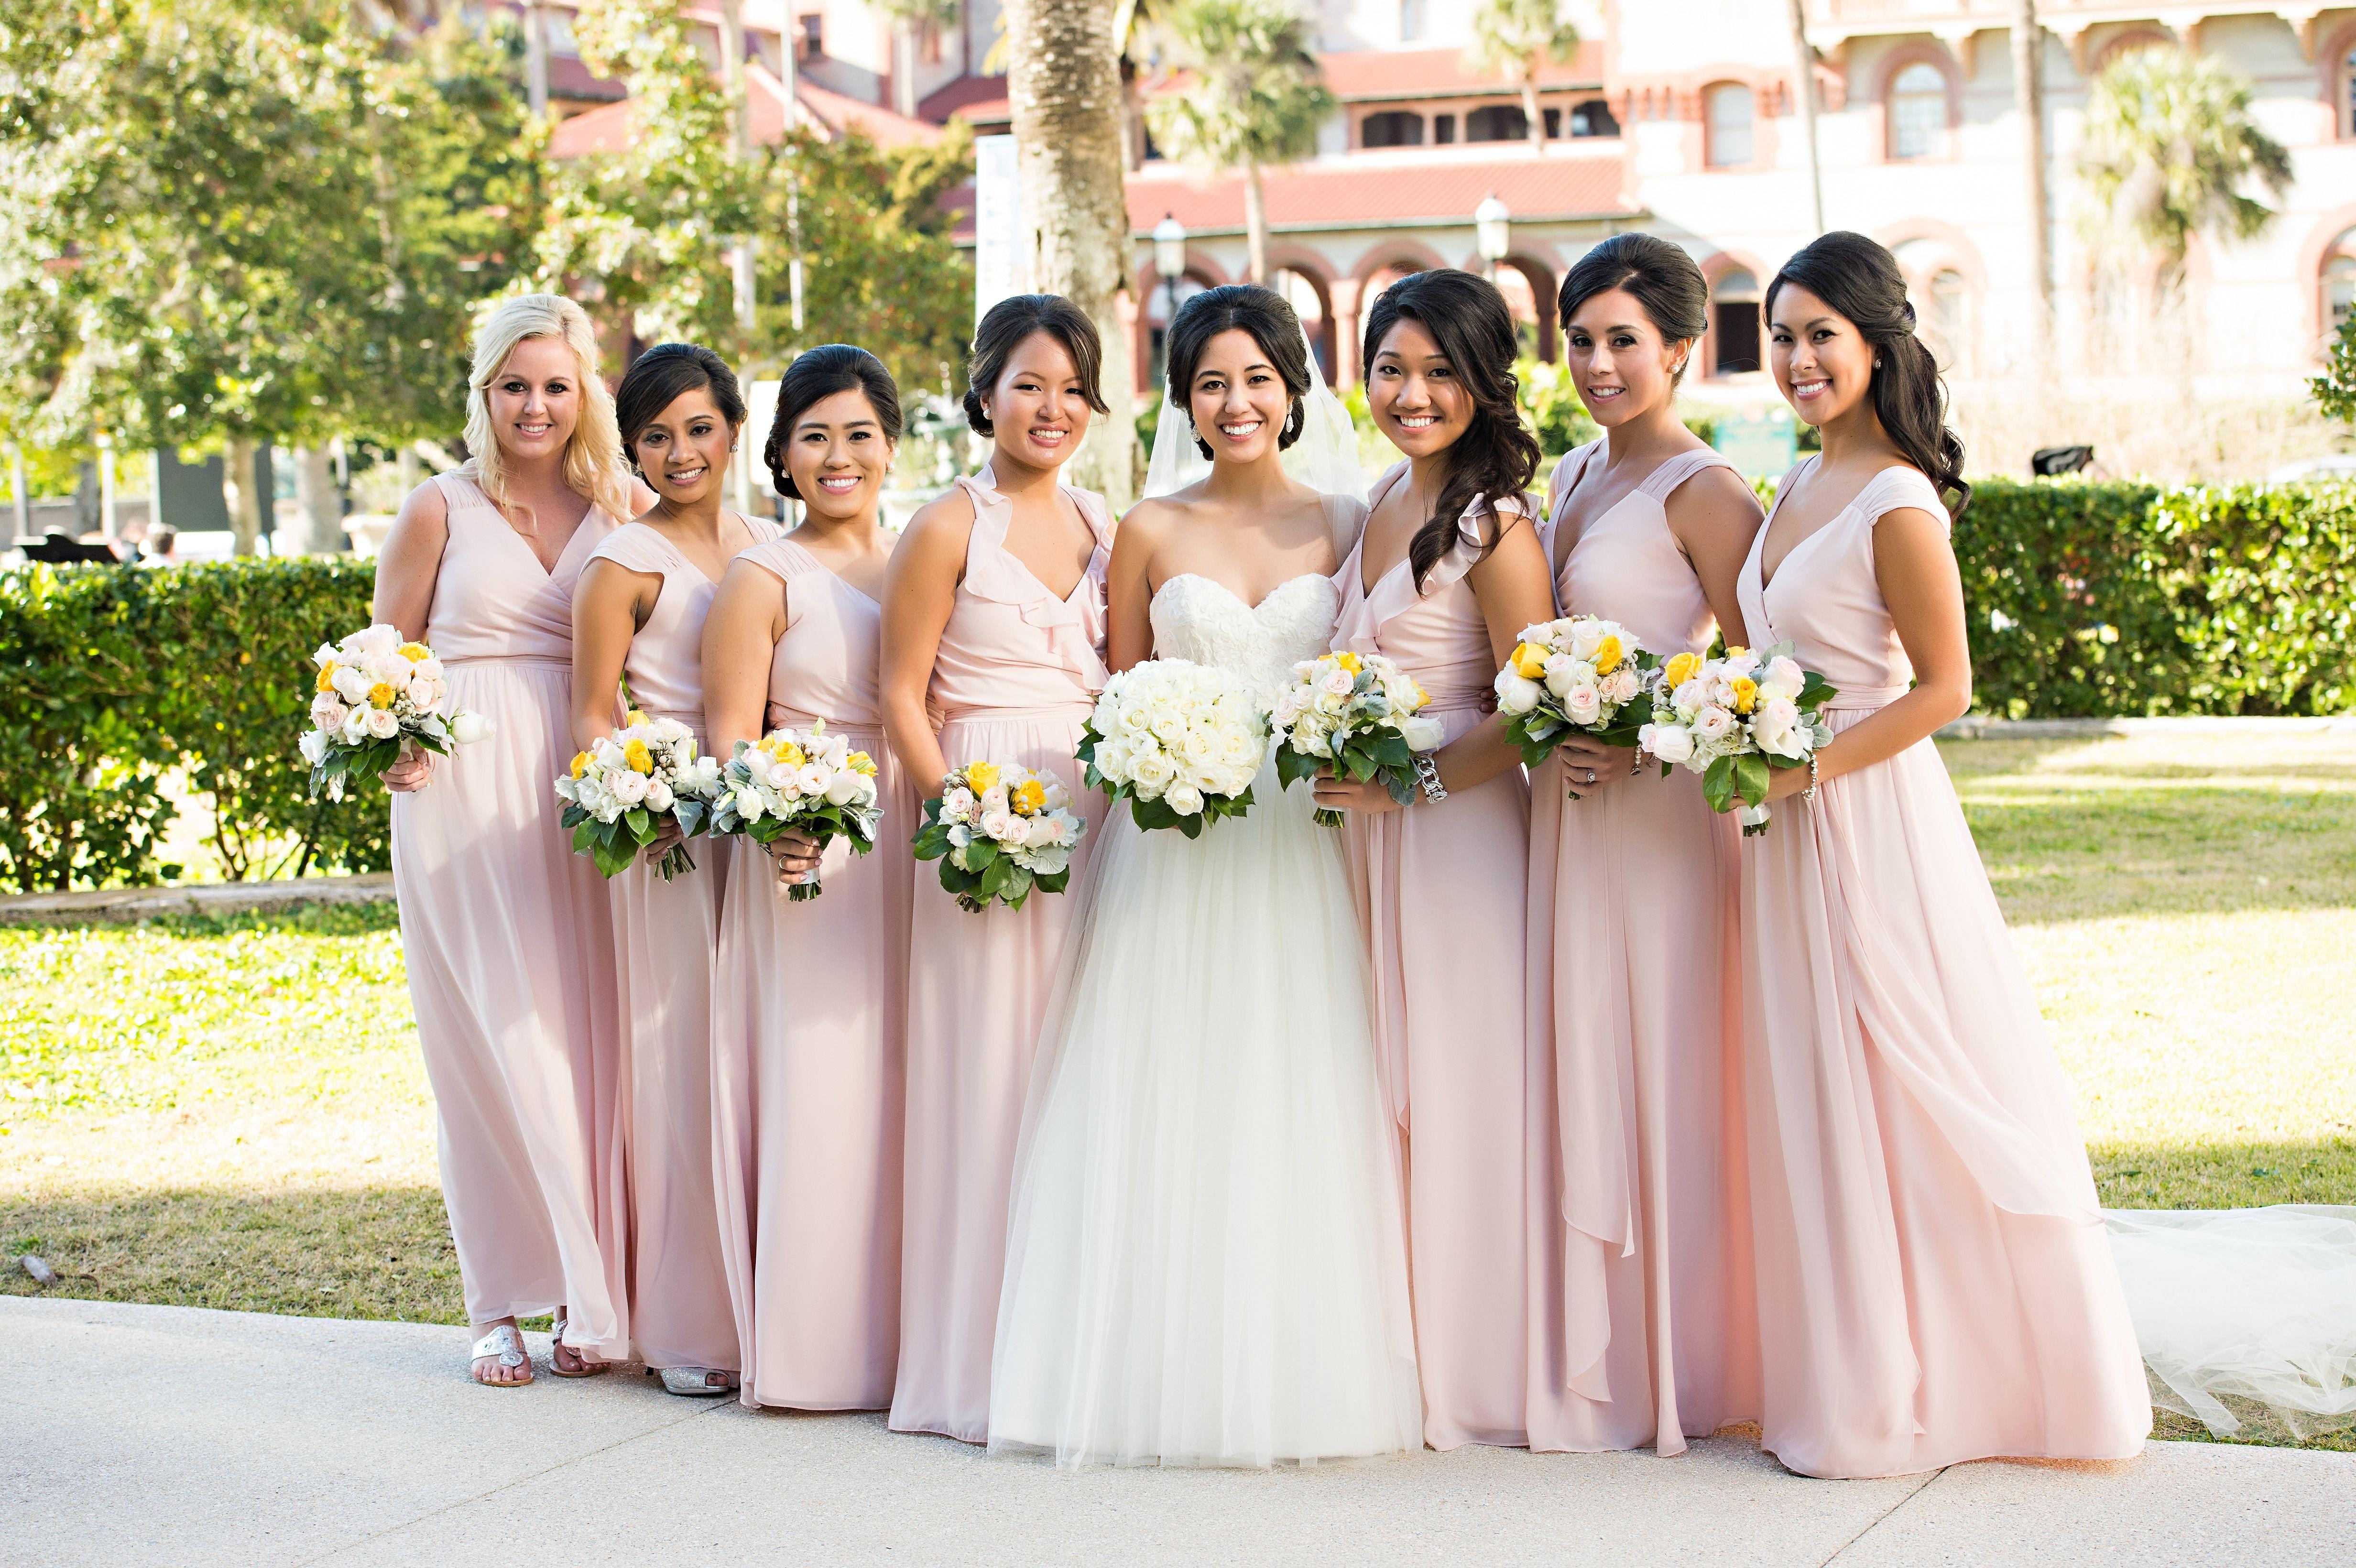 Joanna august blush bridesmaids dresses mariage rose et corail joanna august blush bridesmaids dresses ombrellifo Choice Image